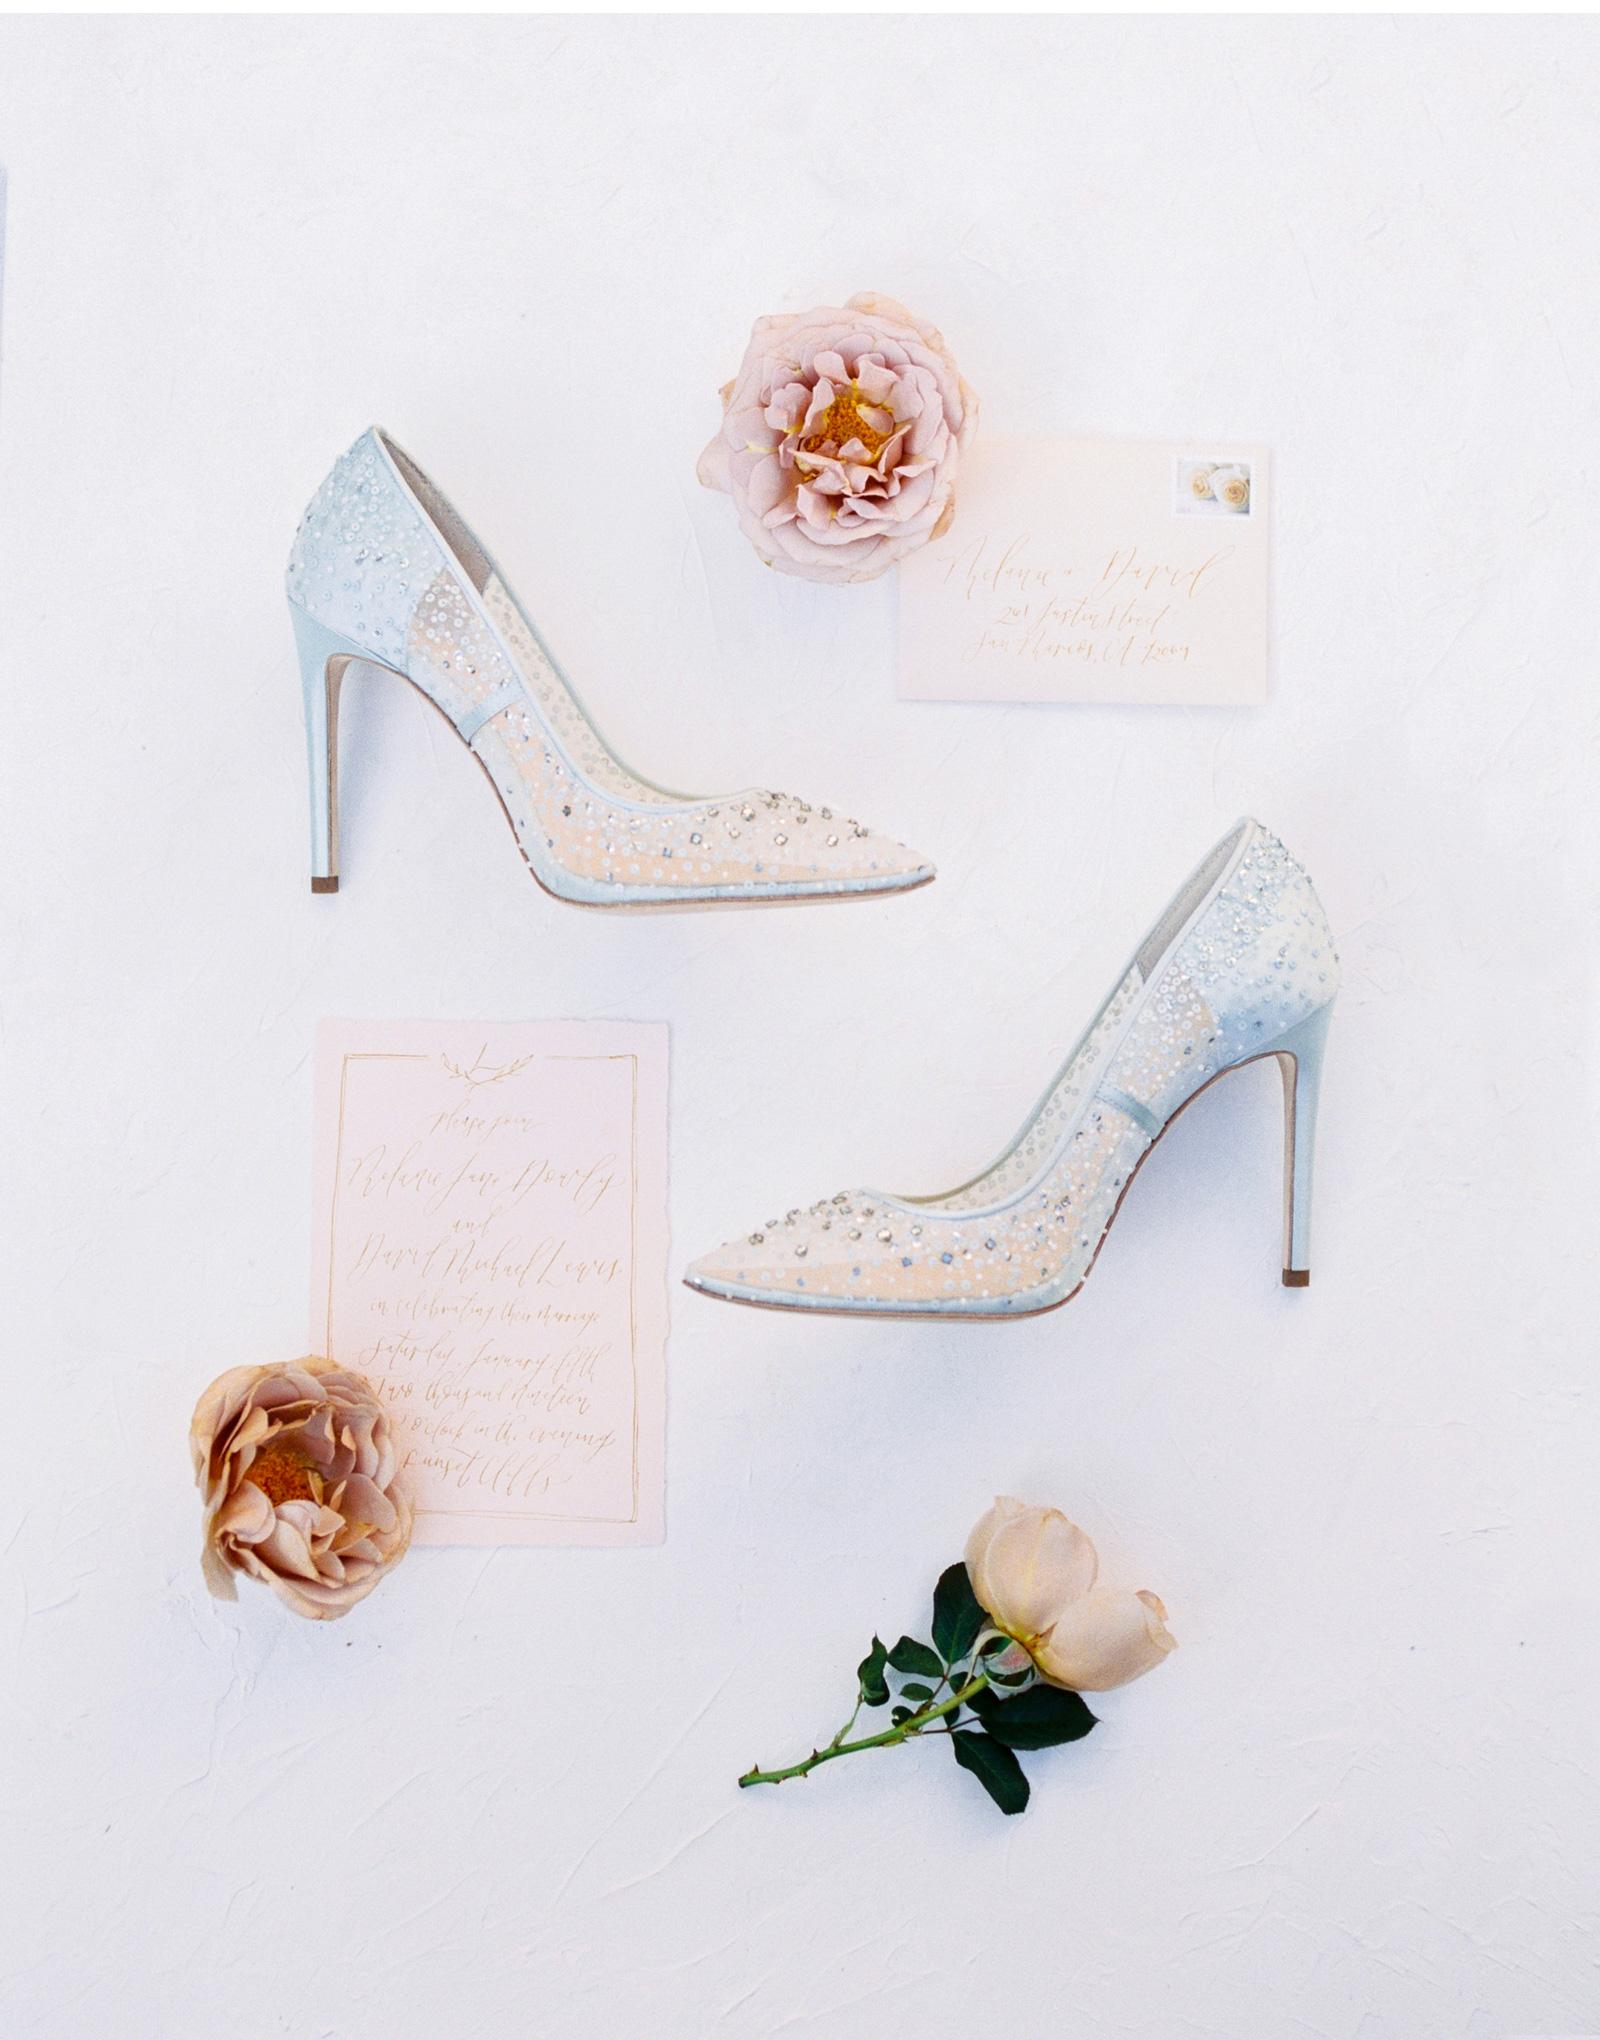 Trendy-Bride-Romantic-Cliffs-Wedding-Natalie-Schutt-Photography_02.jpg